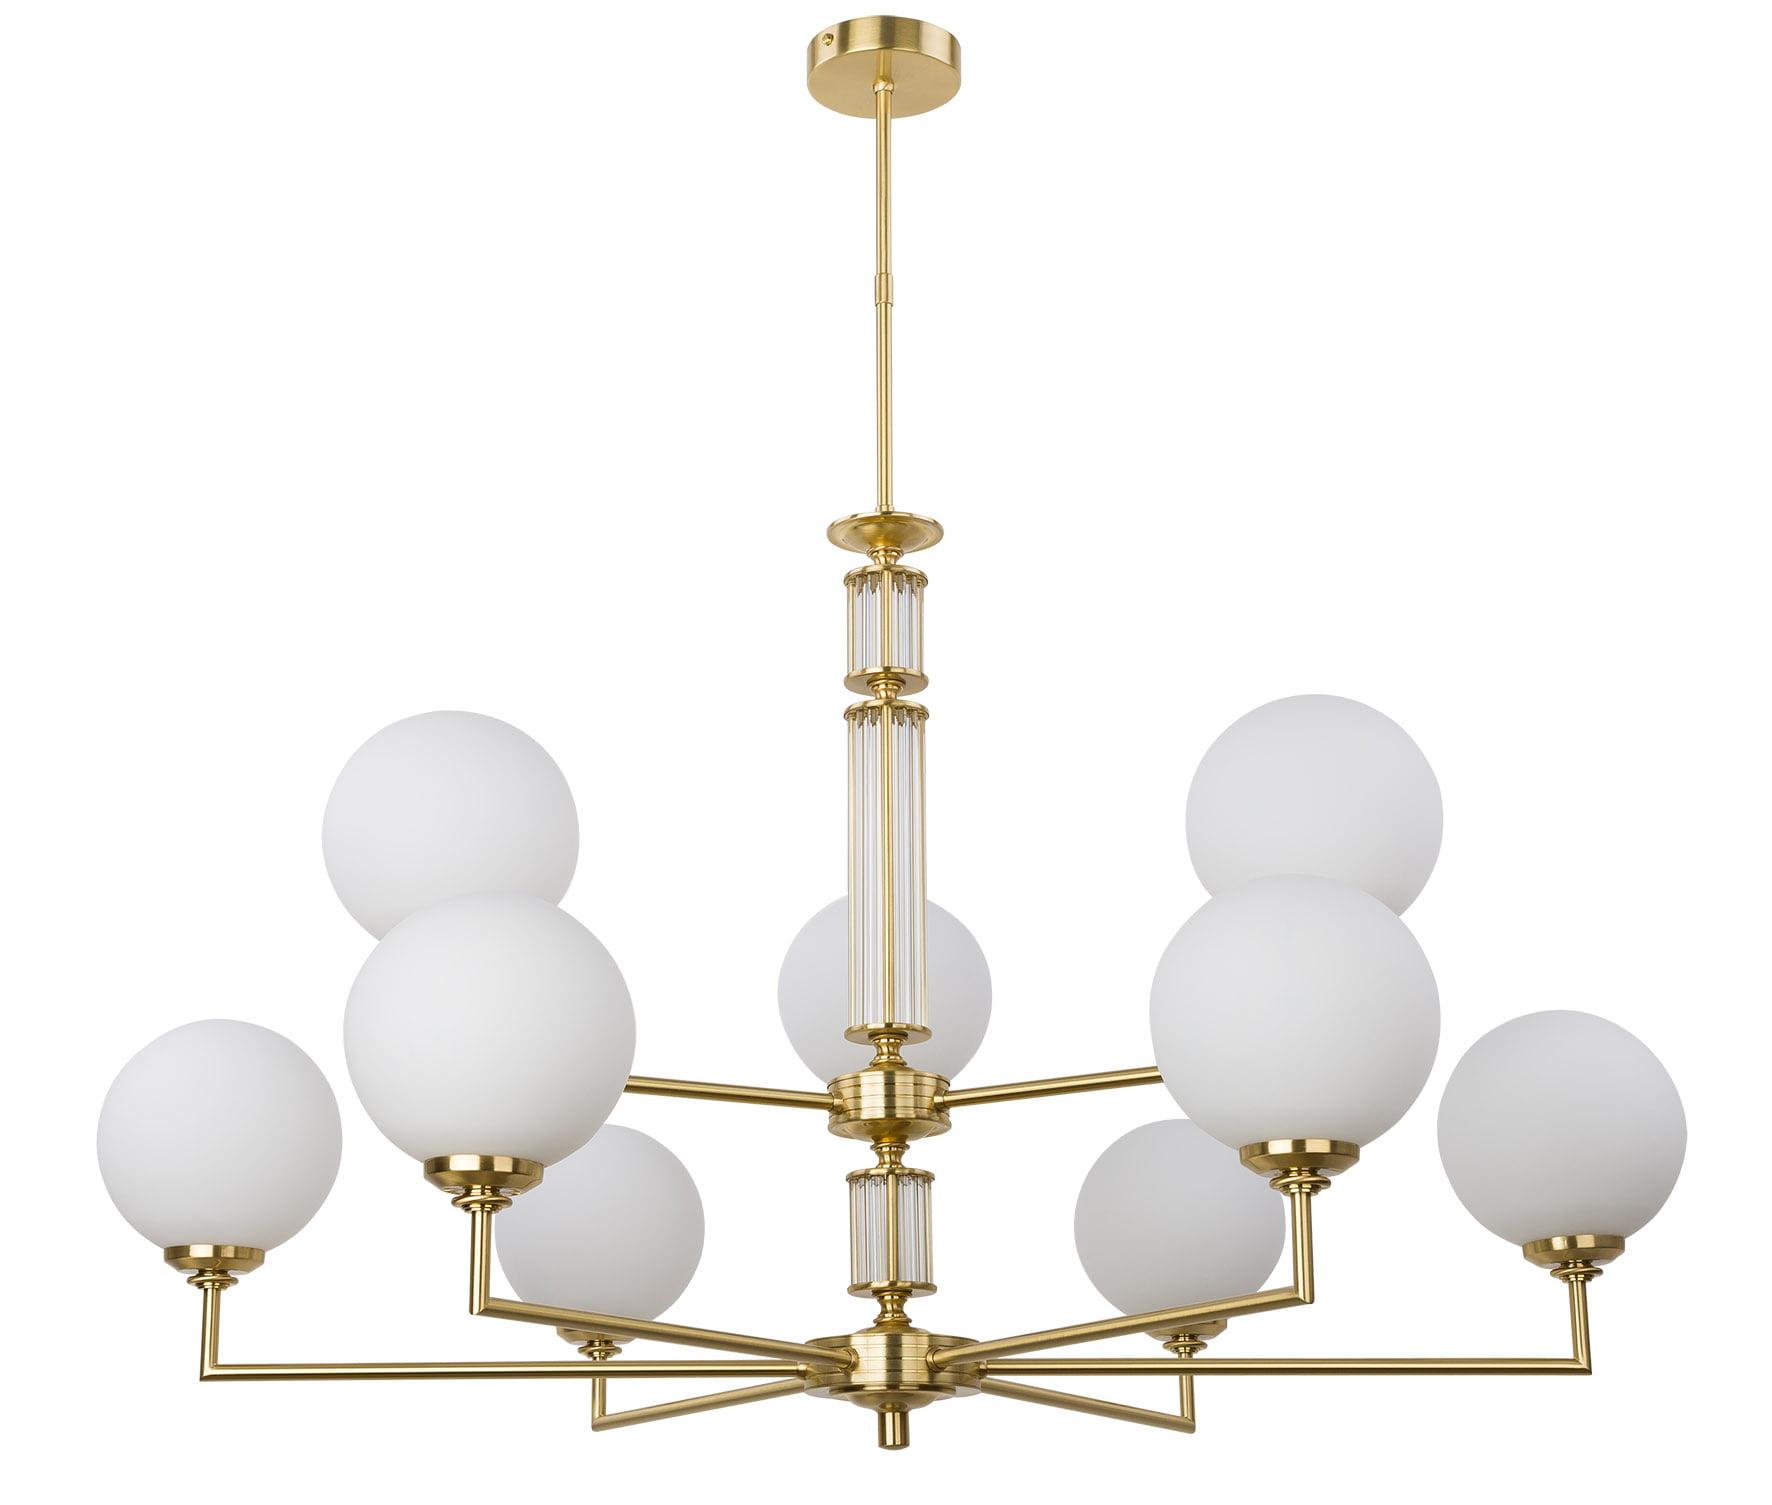 Lighting Room Artu 9 Light Large Chandelier Gold Luxury Chandelier